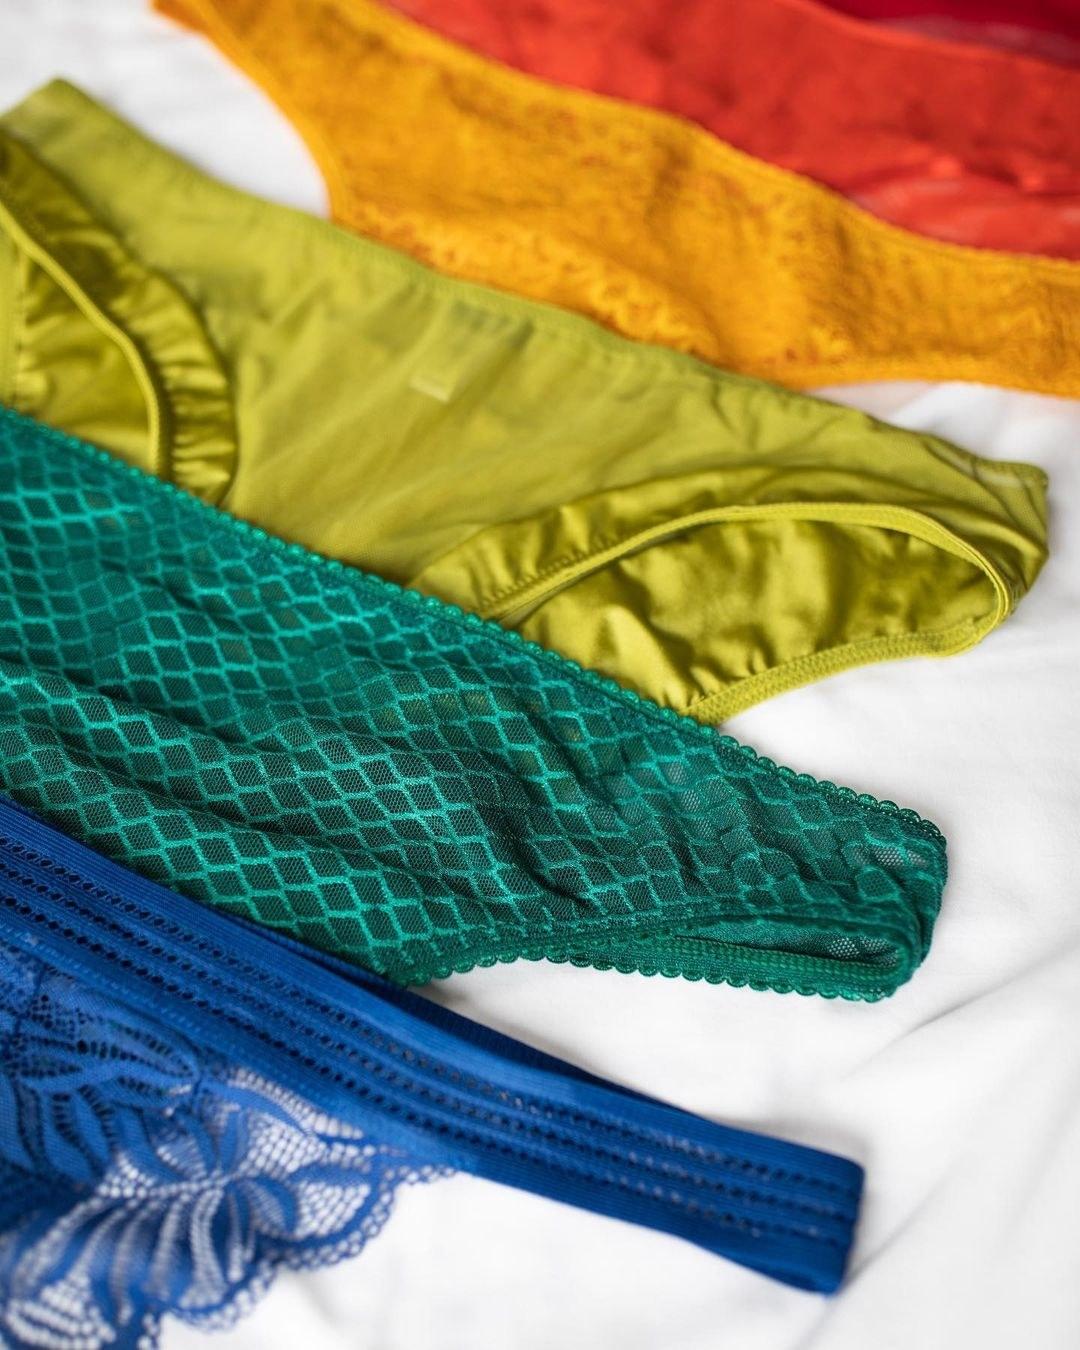 blue, green, yellow, and orange underwear on a bedsheet